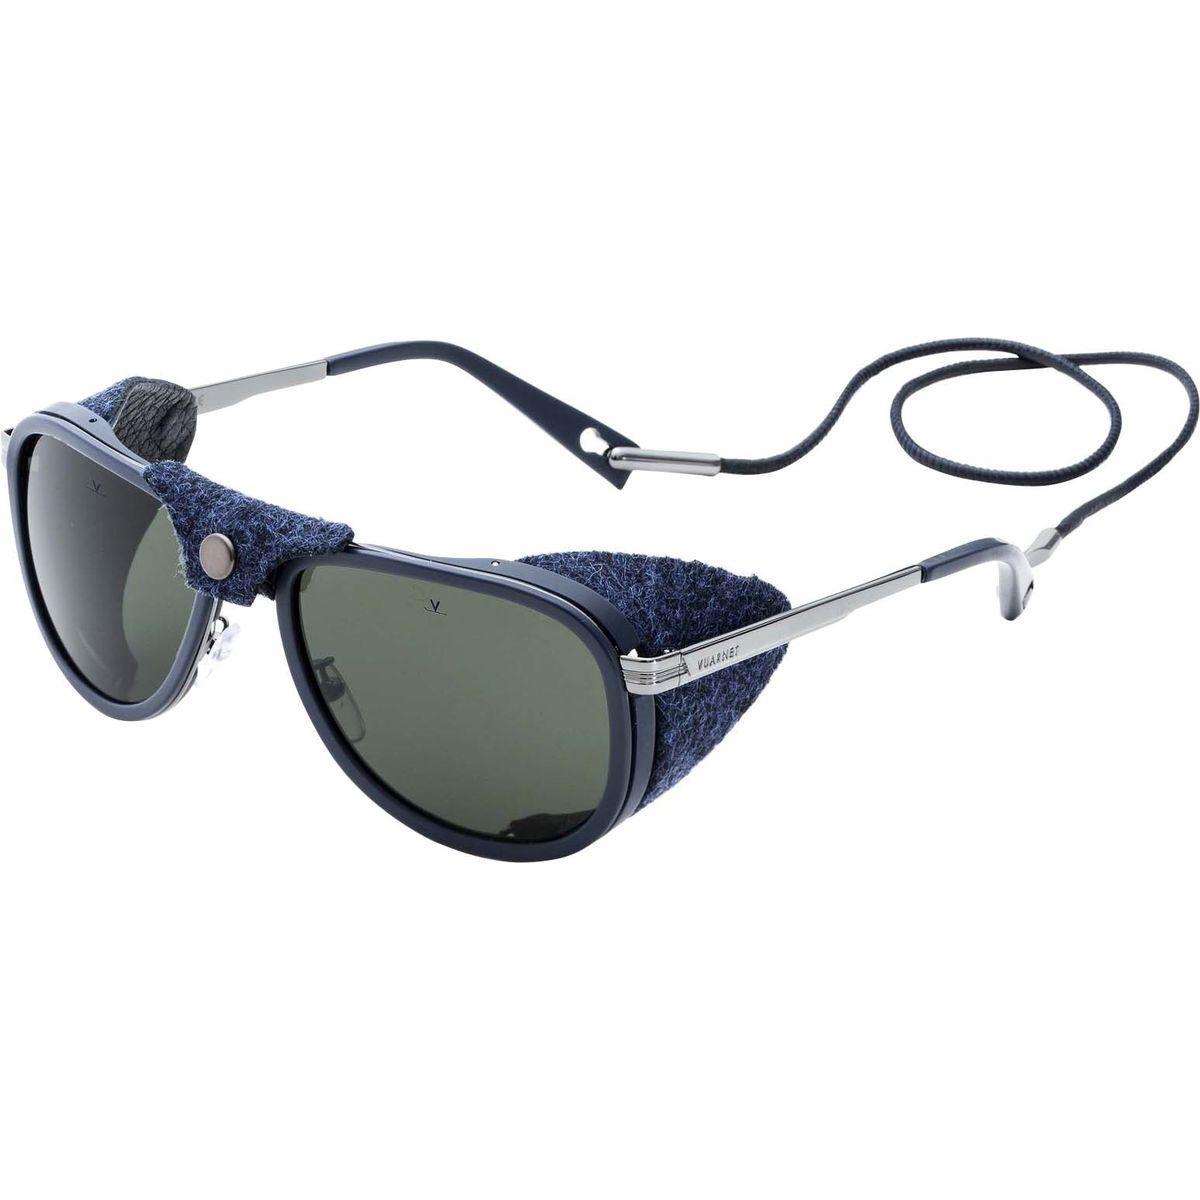 cd0a410c31d Lyst - Vuarnet Vl1315 Glacier Polarized Sunglasses in Blue for Men